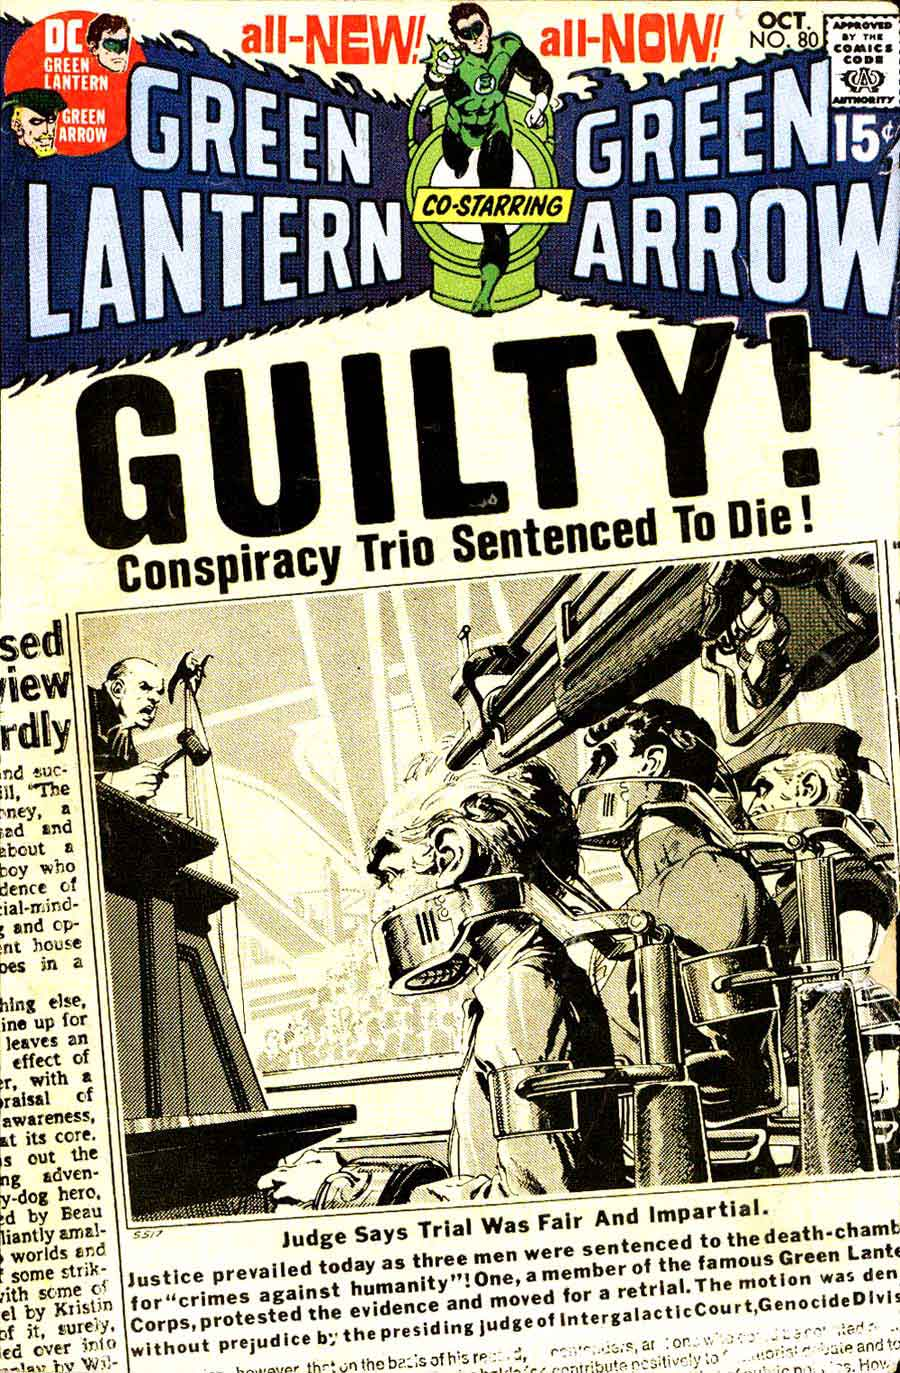 Green Lantern Green Arrow #80 dc comic book cover art by Neal Adams